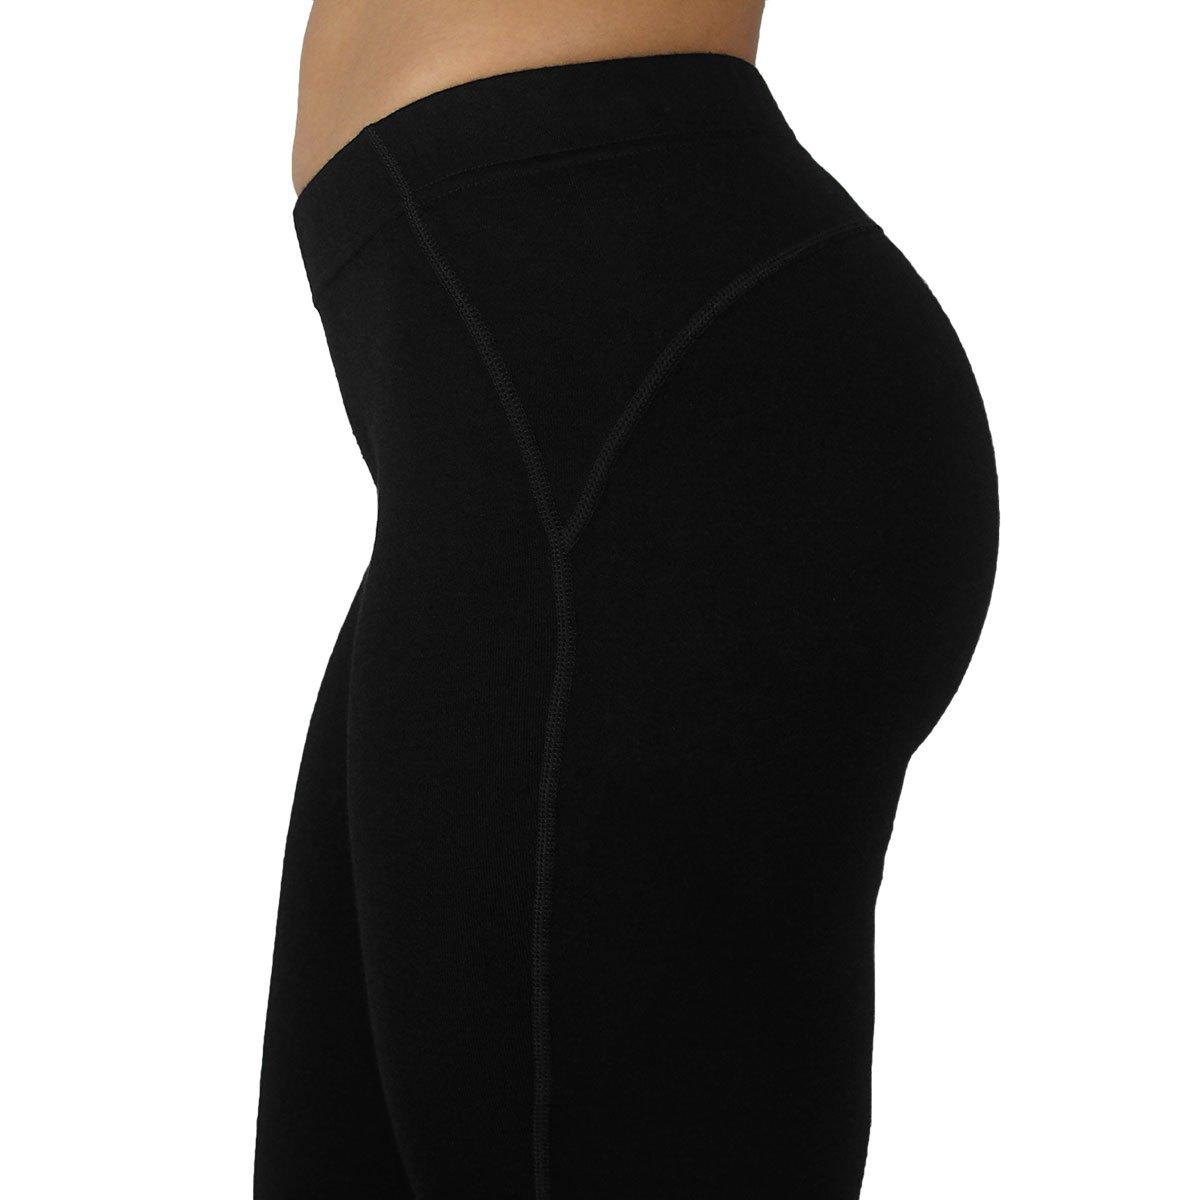 Minus33 Merino Wool 2300 Woolverino Women's Micro Weight Leggings Black Large by Minus33 Merino Wool (Image #6)